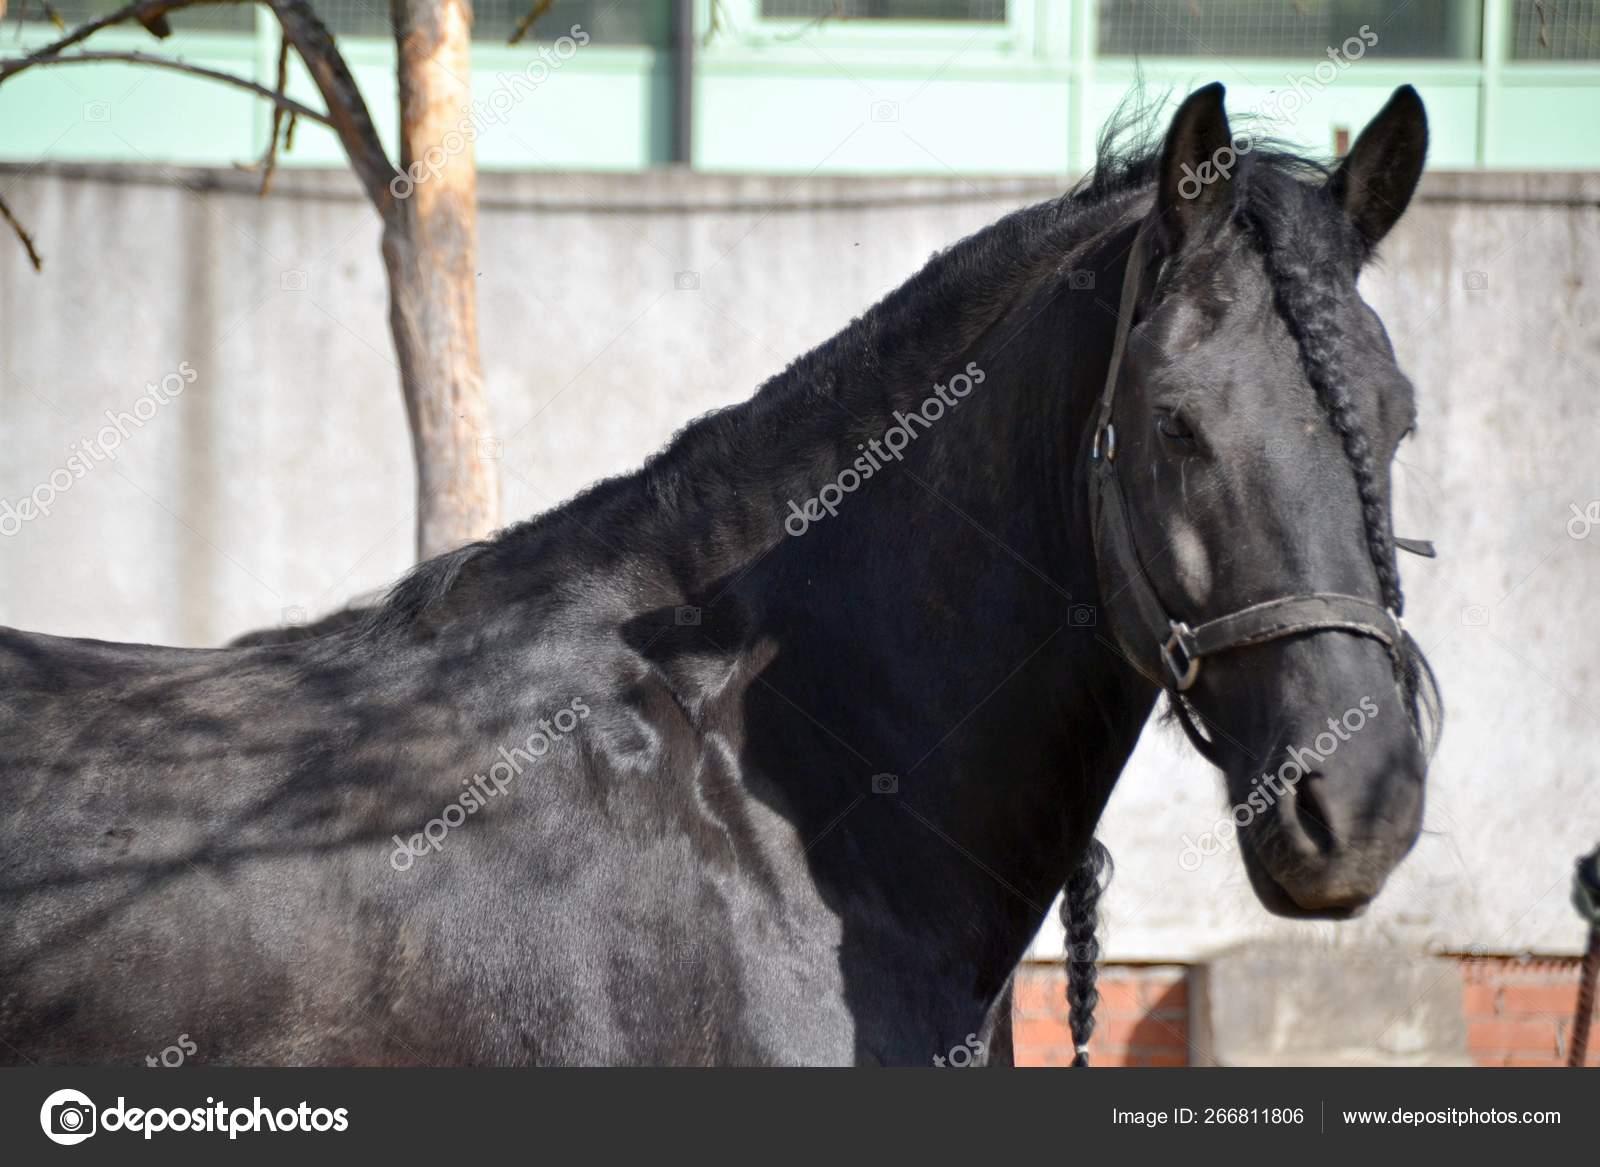 Big Black Horse Friesian Breed Stock Photo C Danio69 266811806